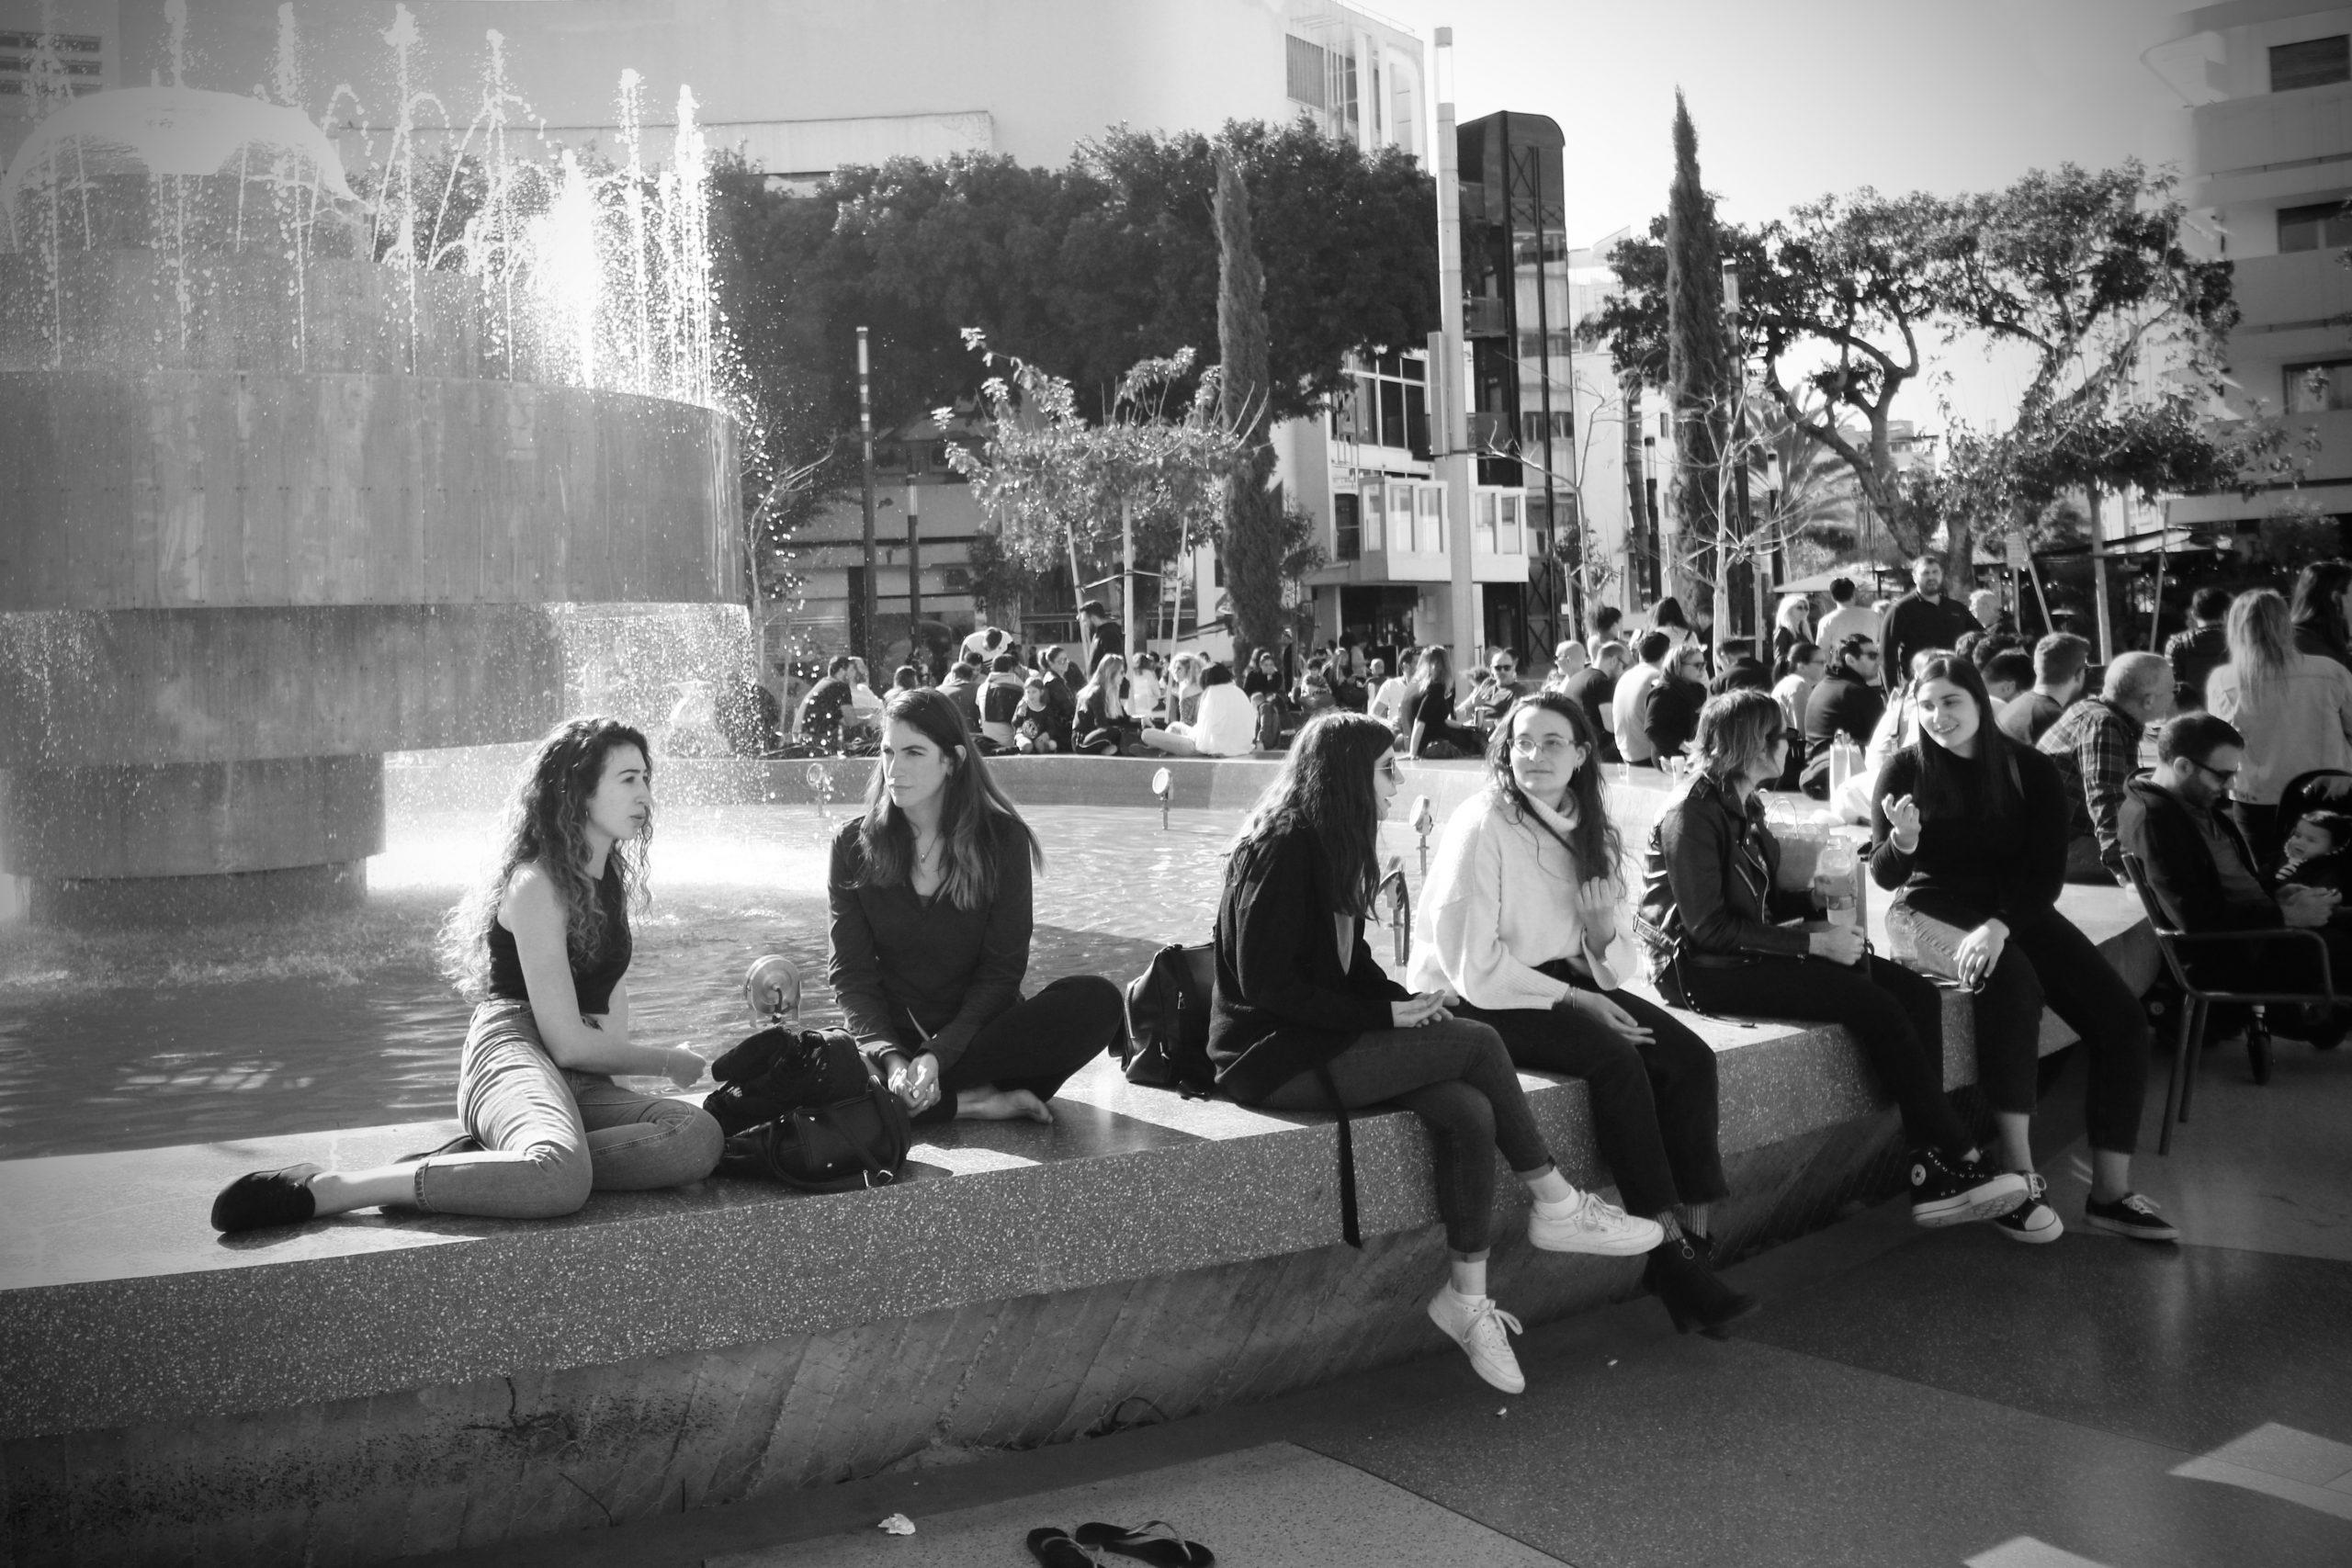 Tel Aviv, the city of yuppies